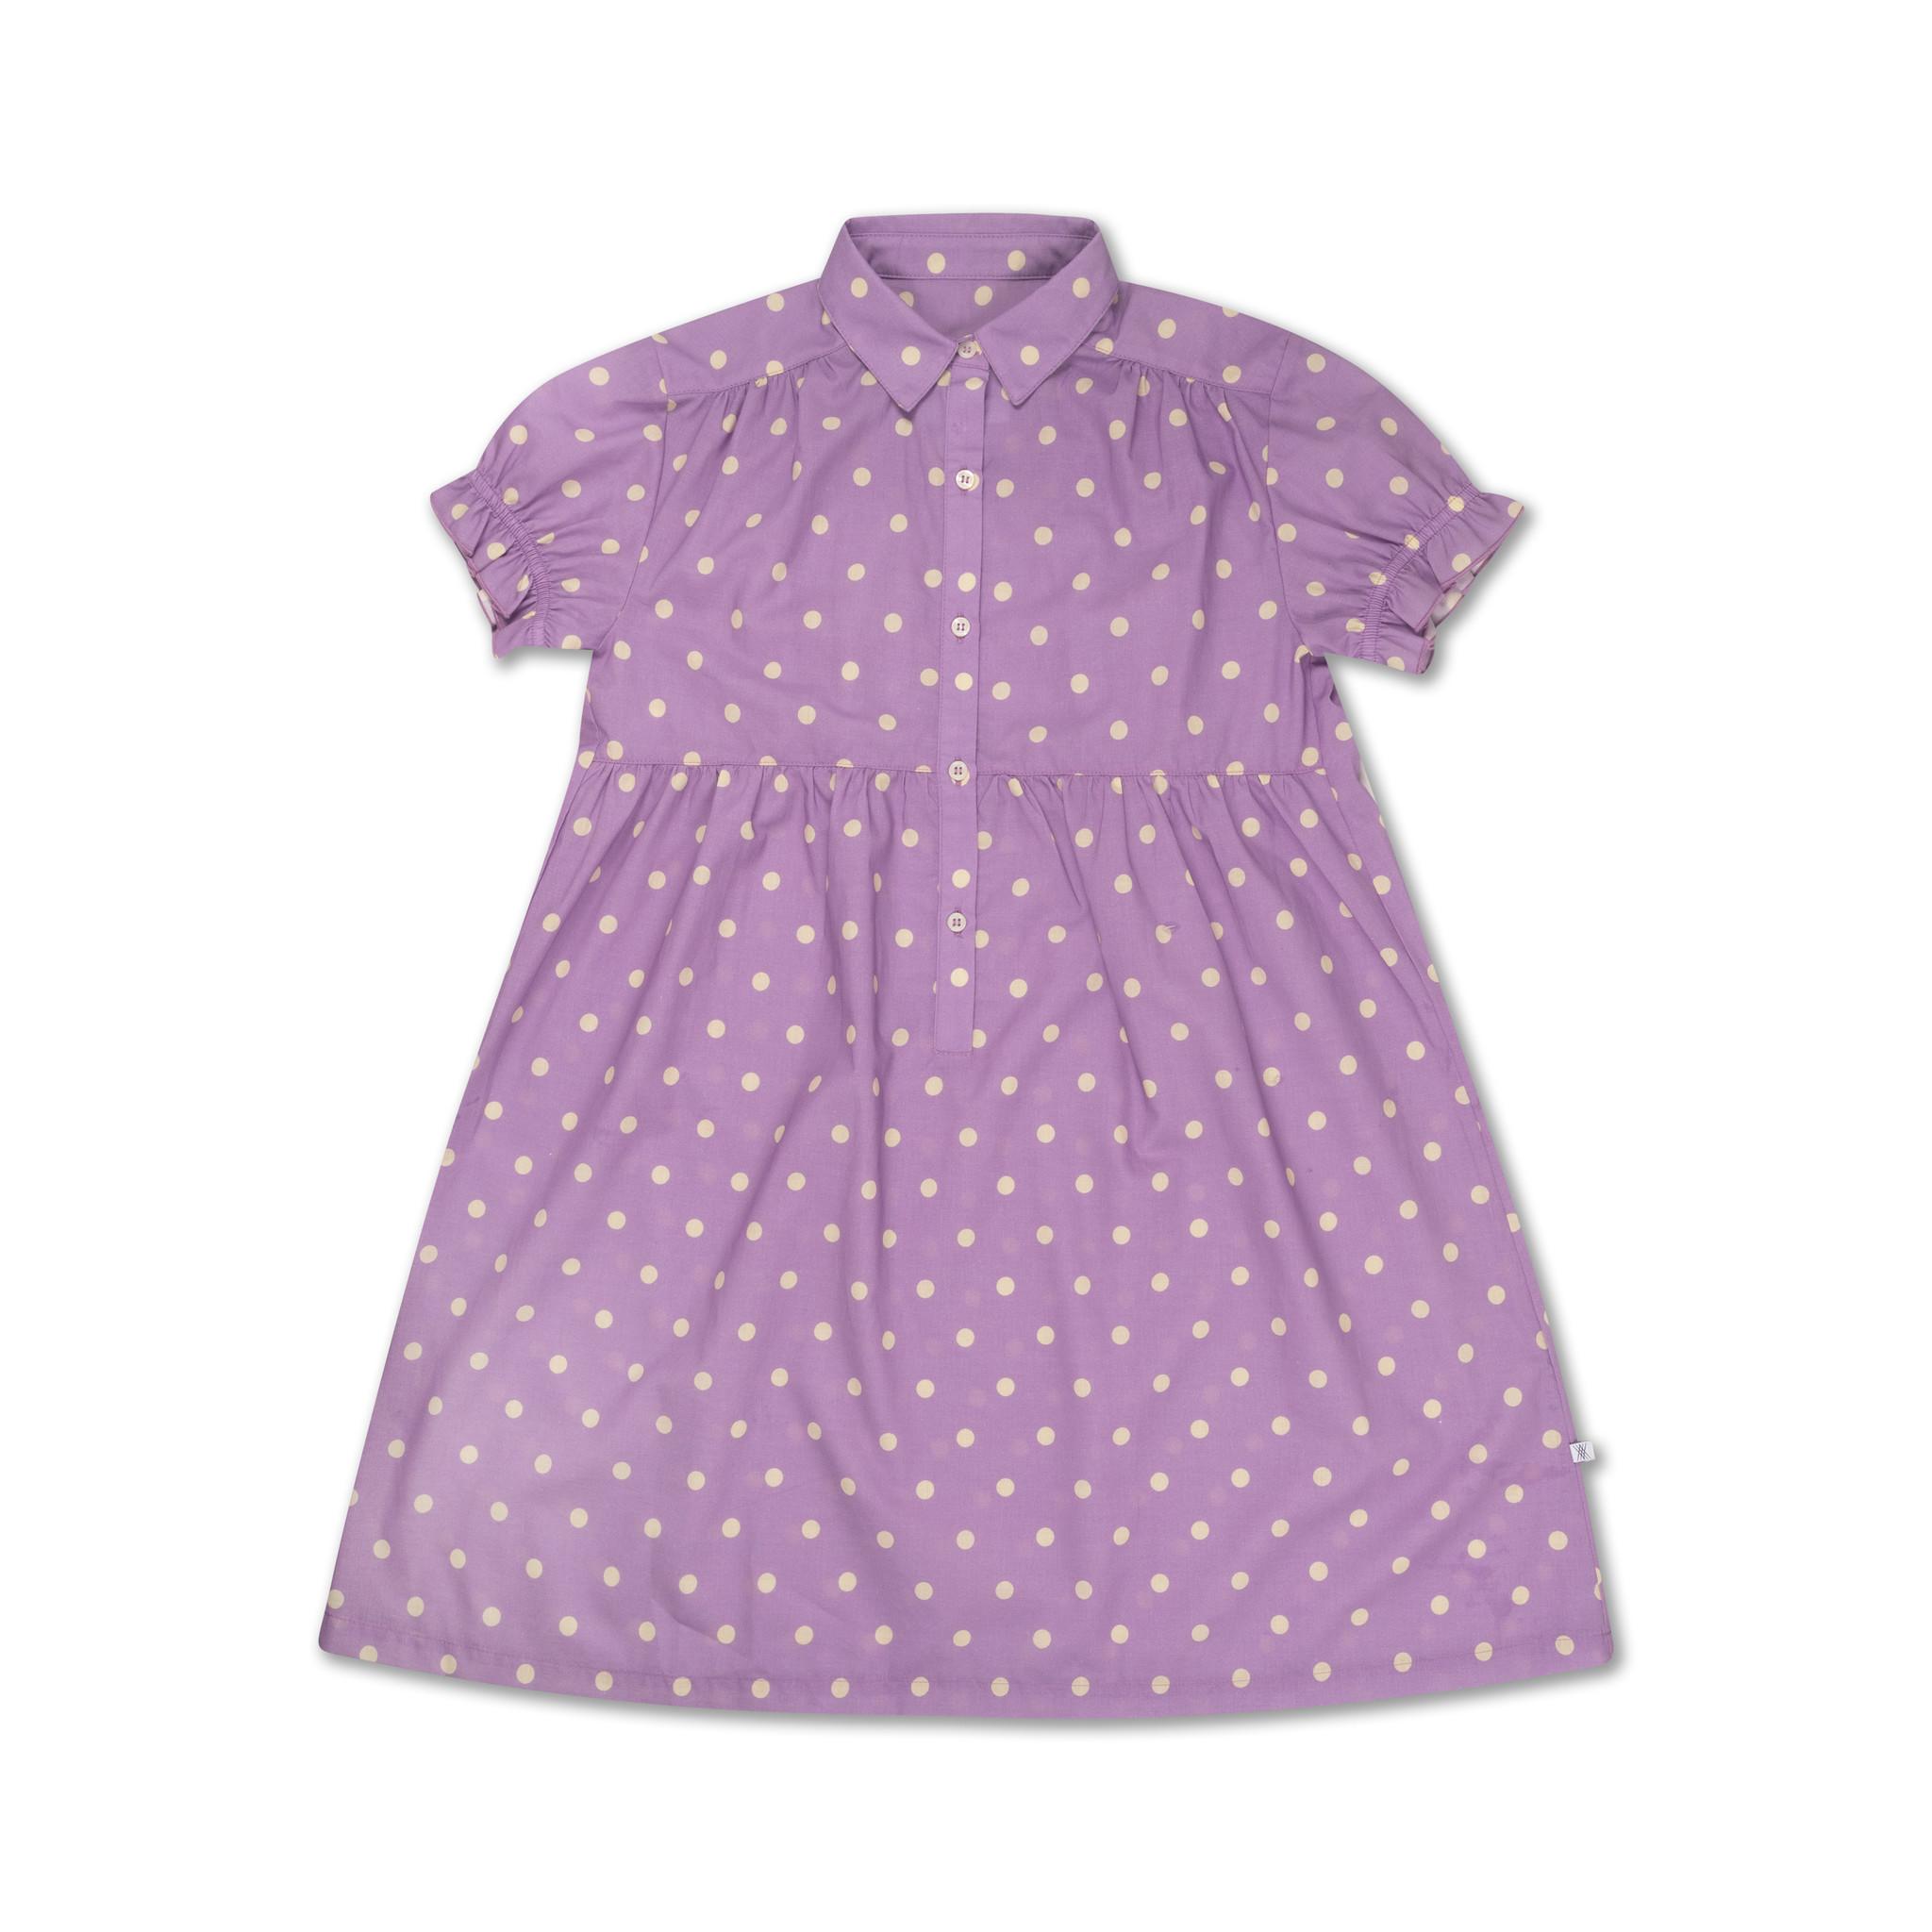 Dreamy dress - Greyish Lavender Polka Dot-1